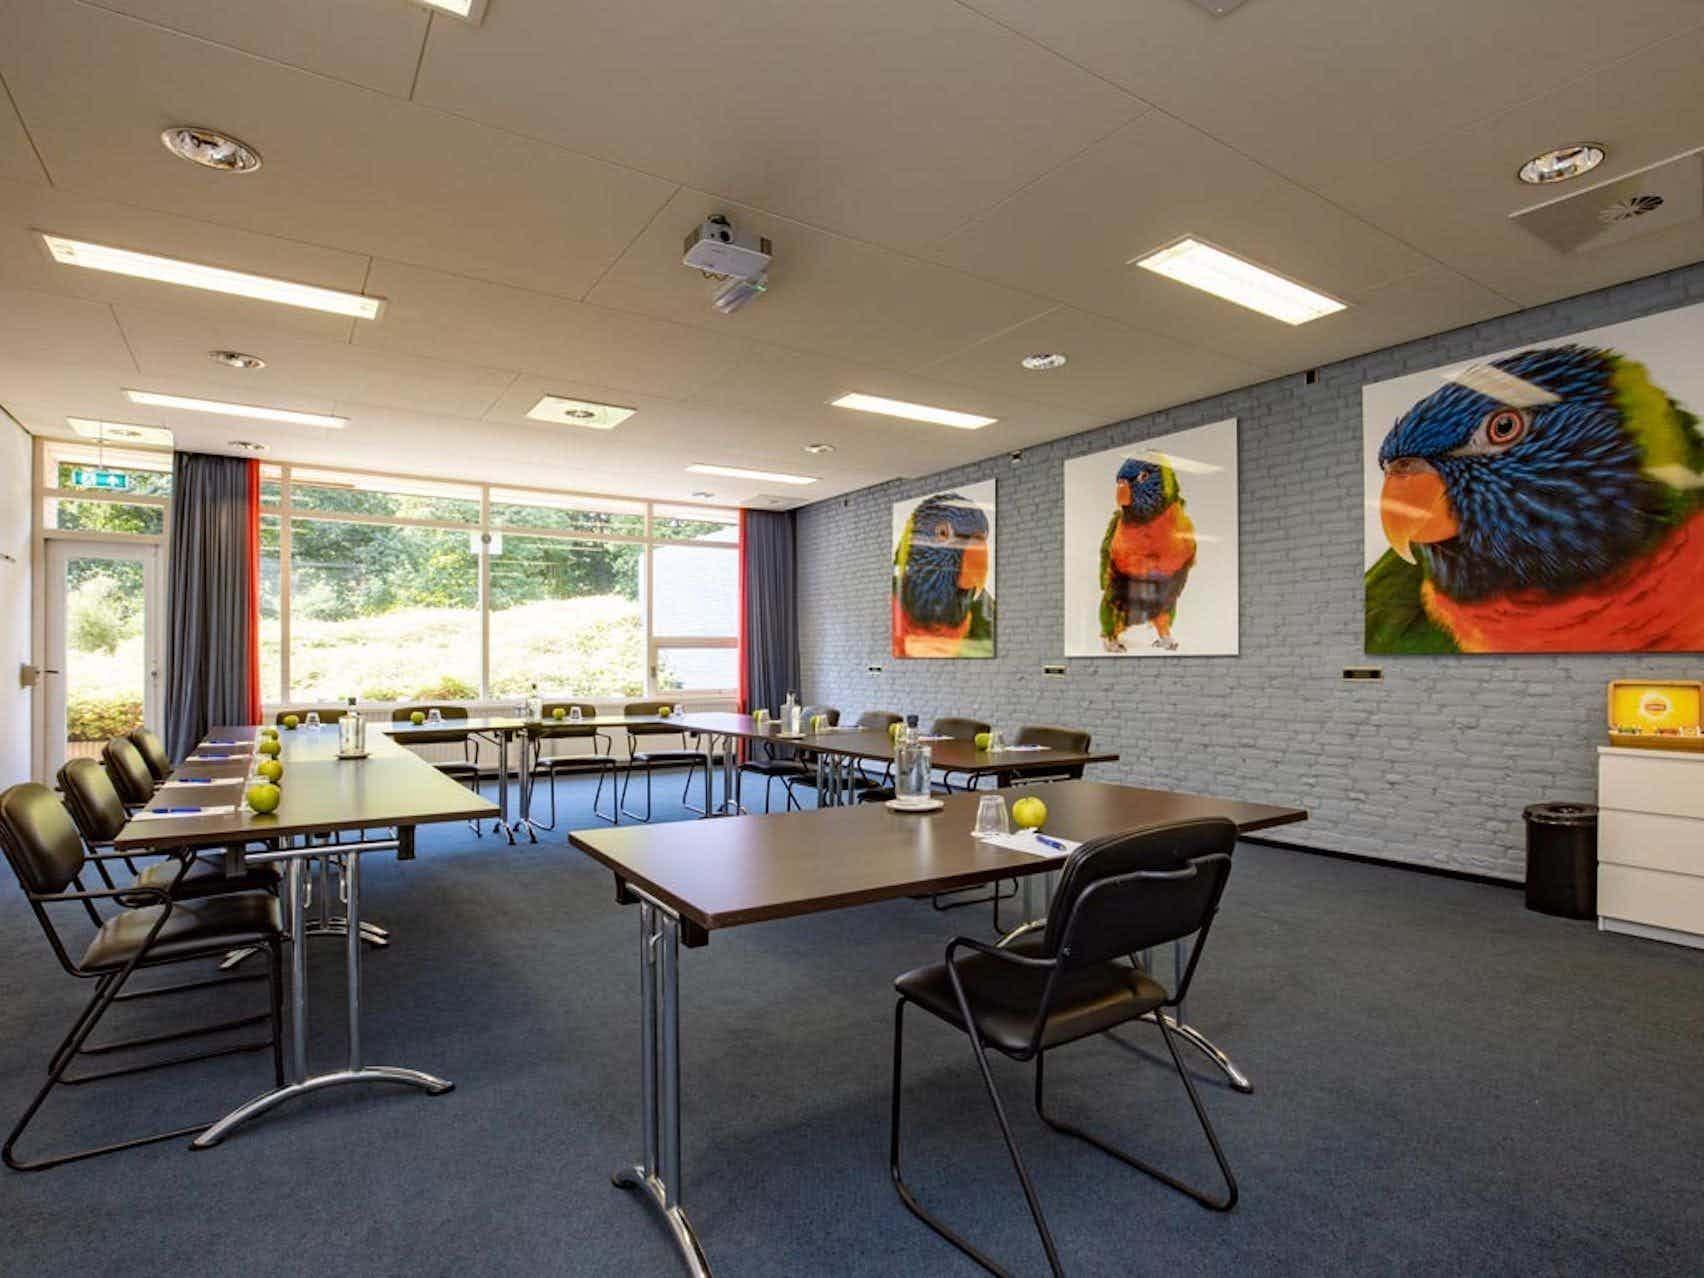 Meeting Room 4, Fletcher Hotels - Amersfoort